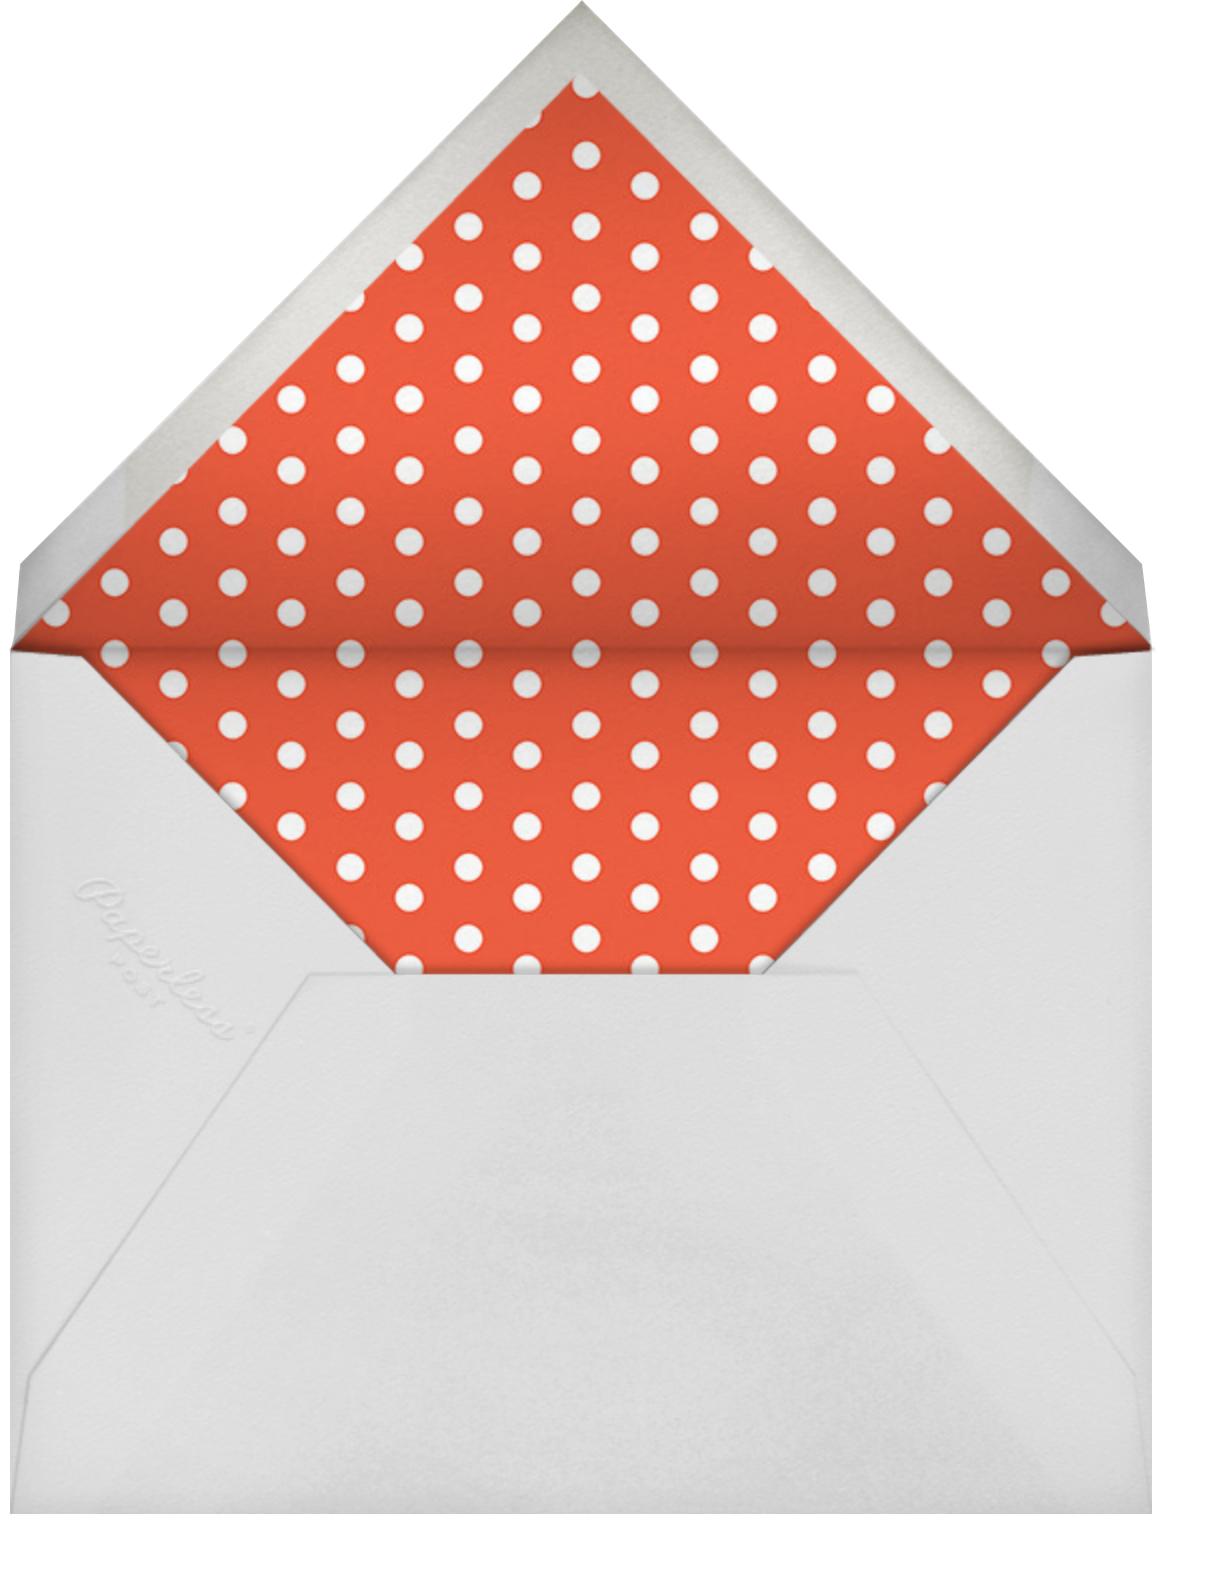 Ski Shades - Deep - Rifle Paper Co. - Winter entertaining - envelope back